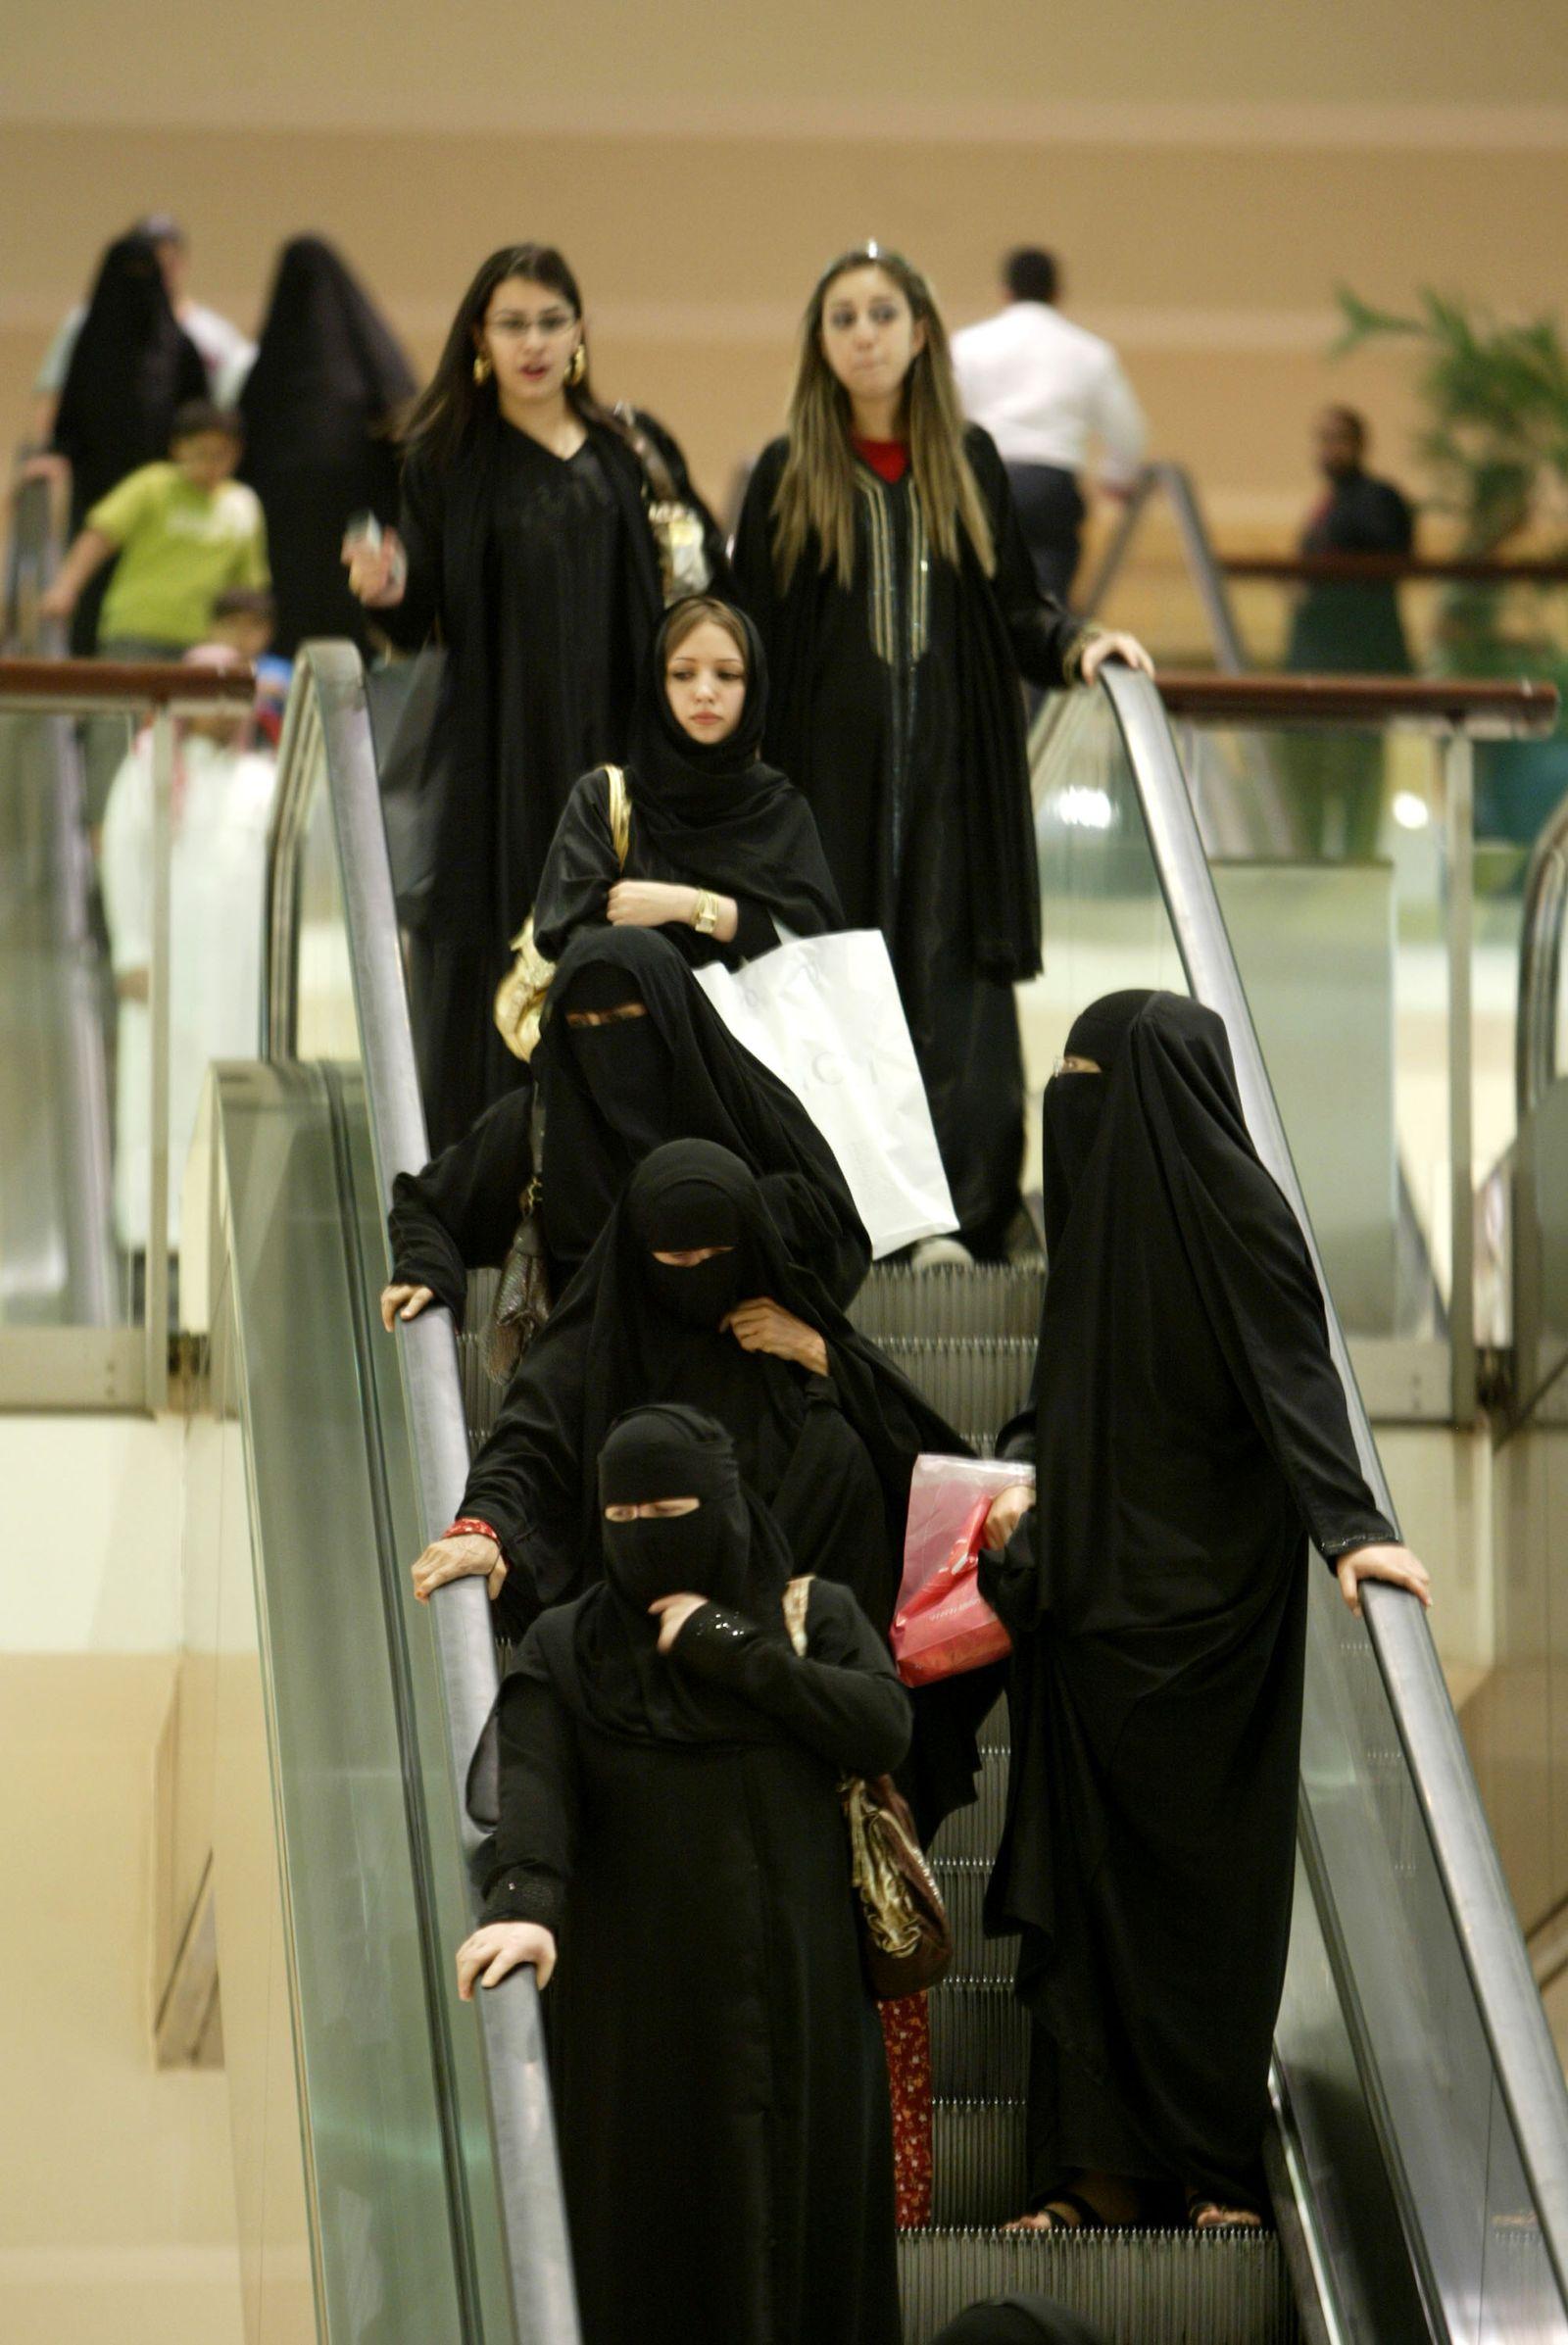 Saudi-Arabien / Frauen / Riad